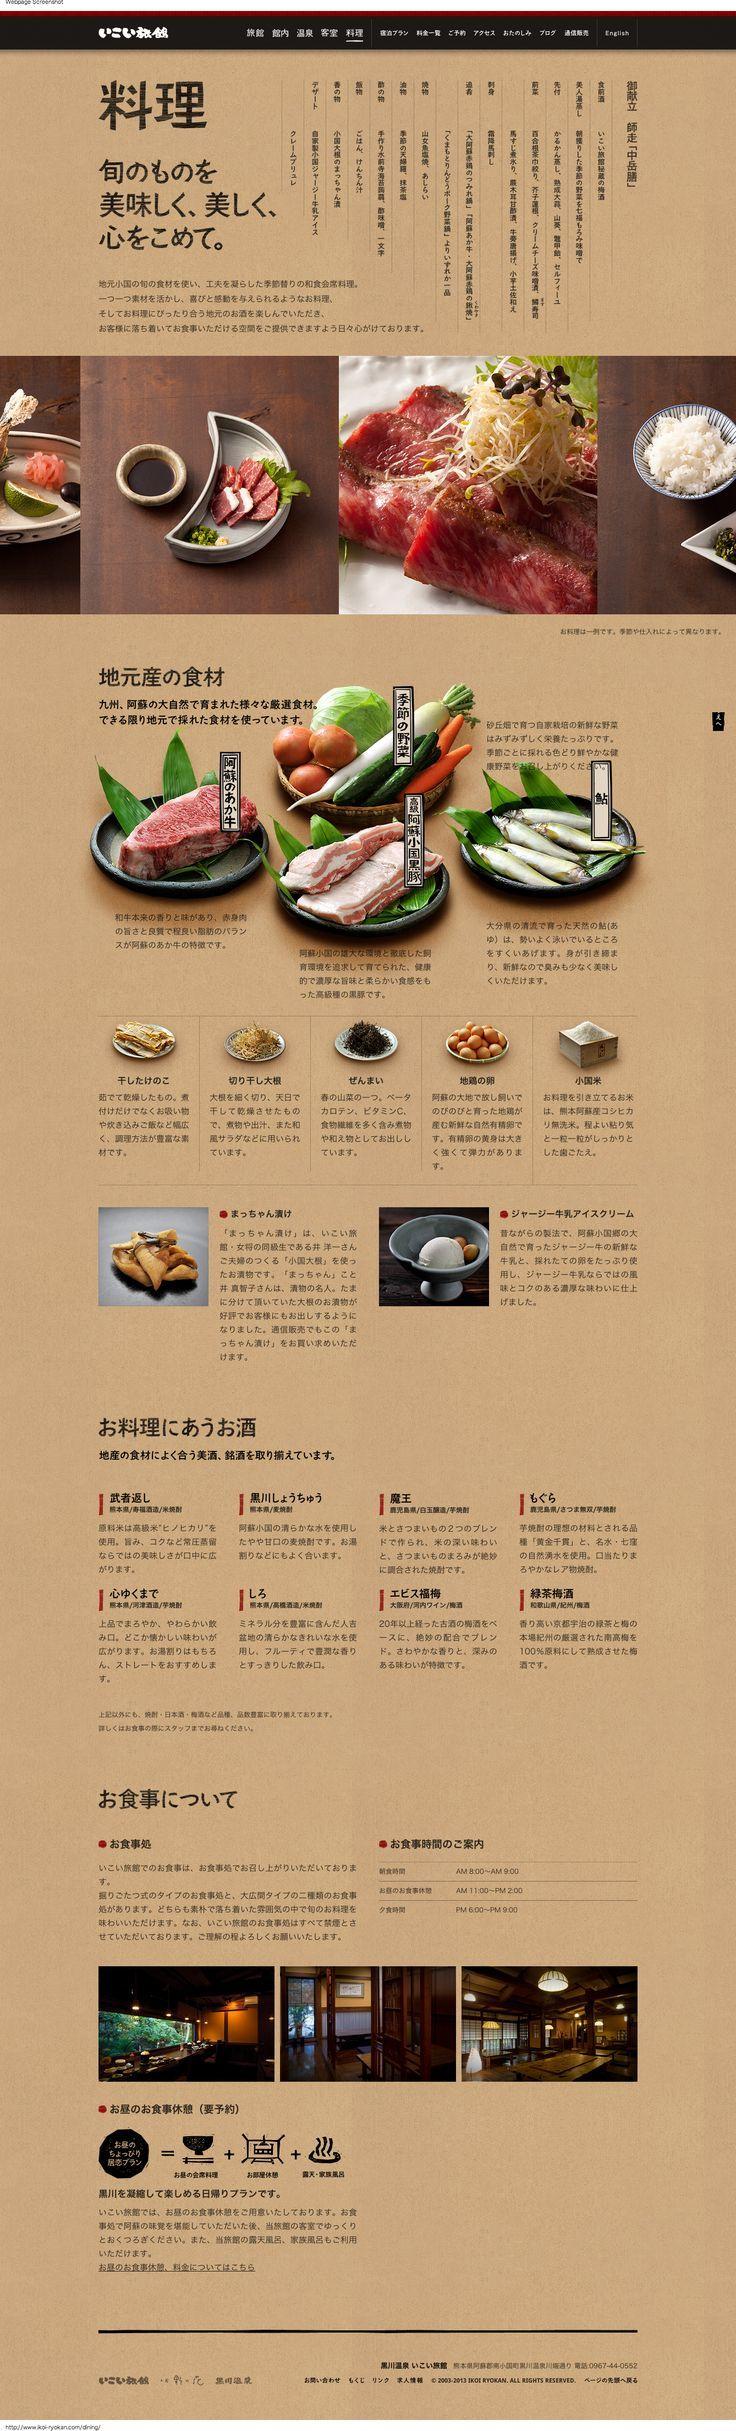 #webdesign #food: